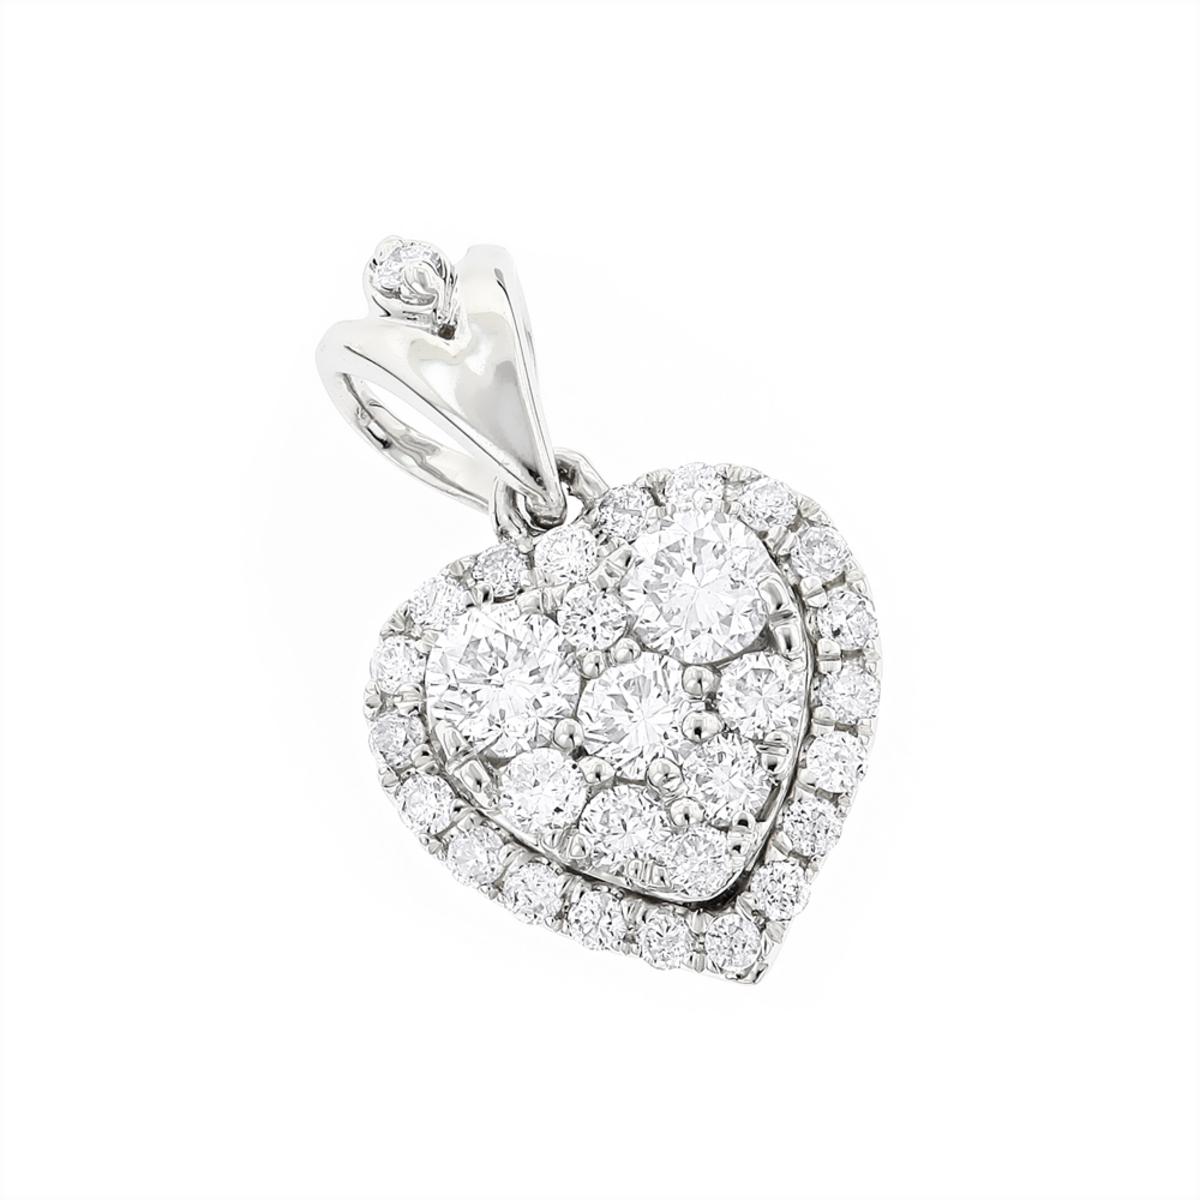 Designer Diamond Heart Pendant in 14k Gold 0.7ct G-H VS-SI Diamonds